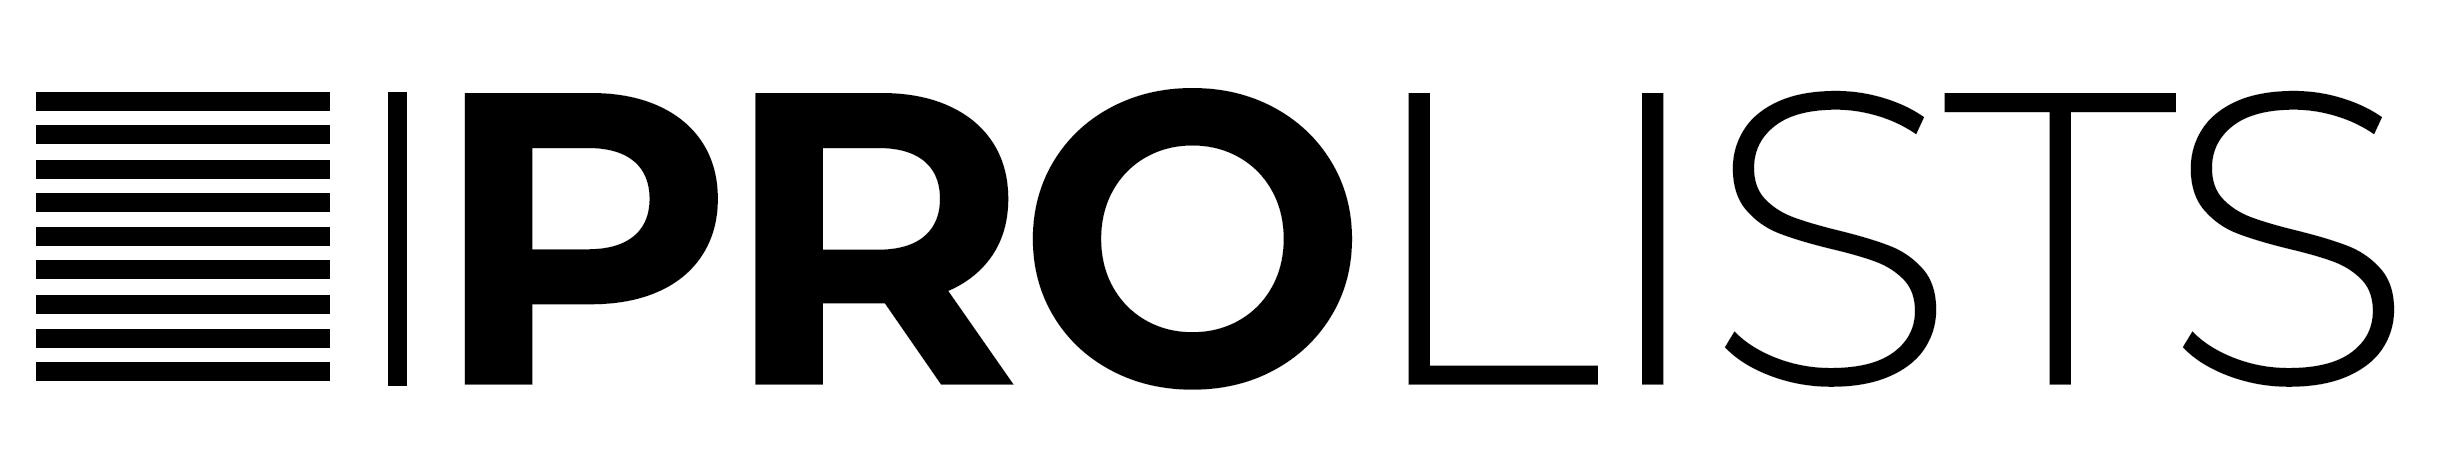 Prolists